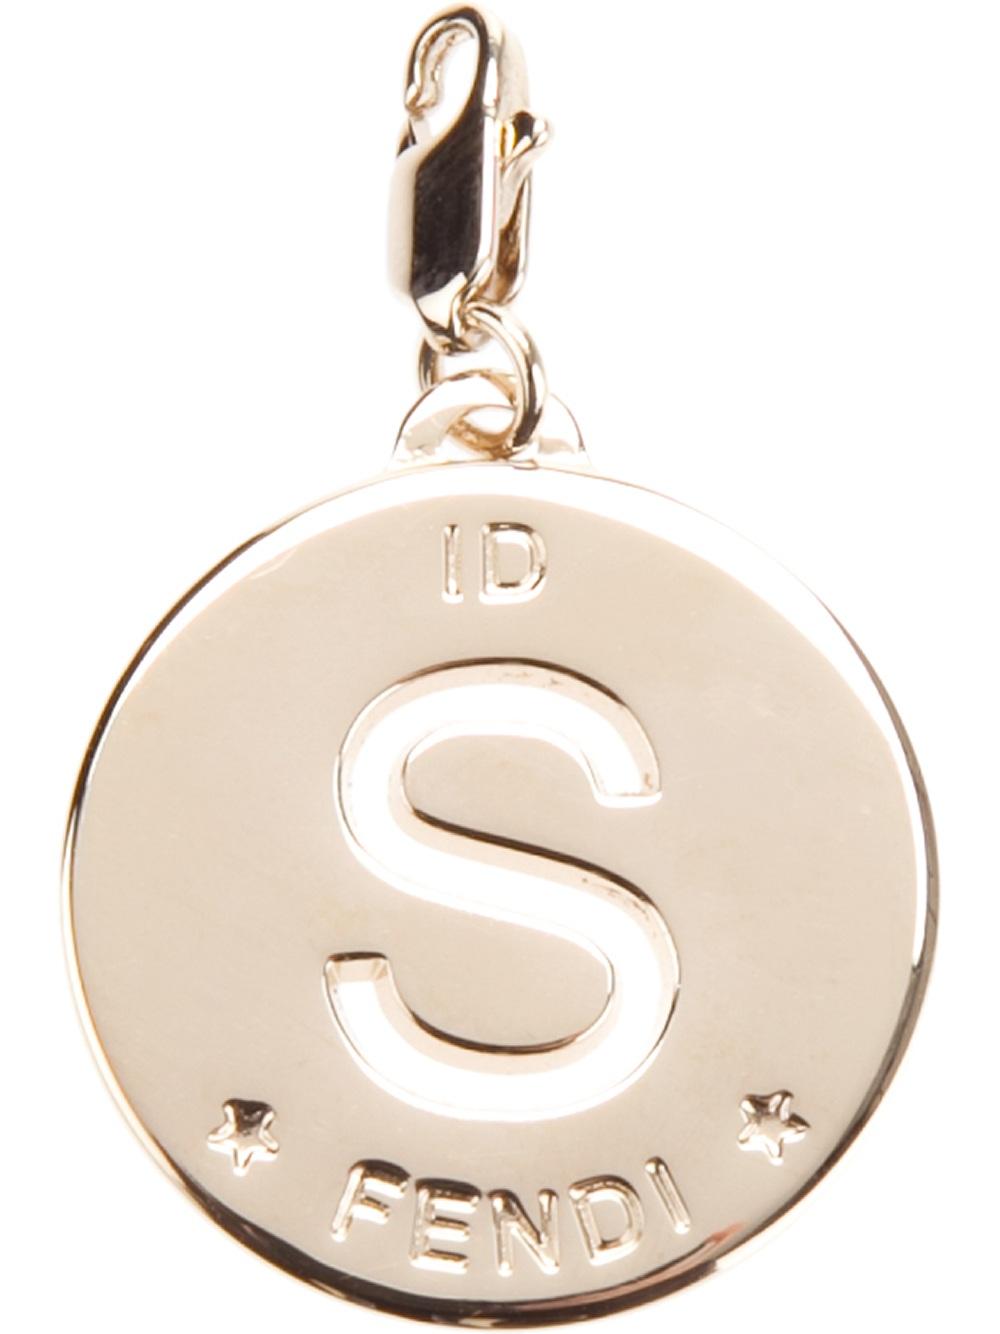 fendi letter charm With fendi necklace letter